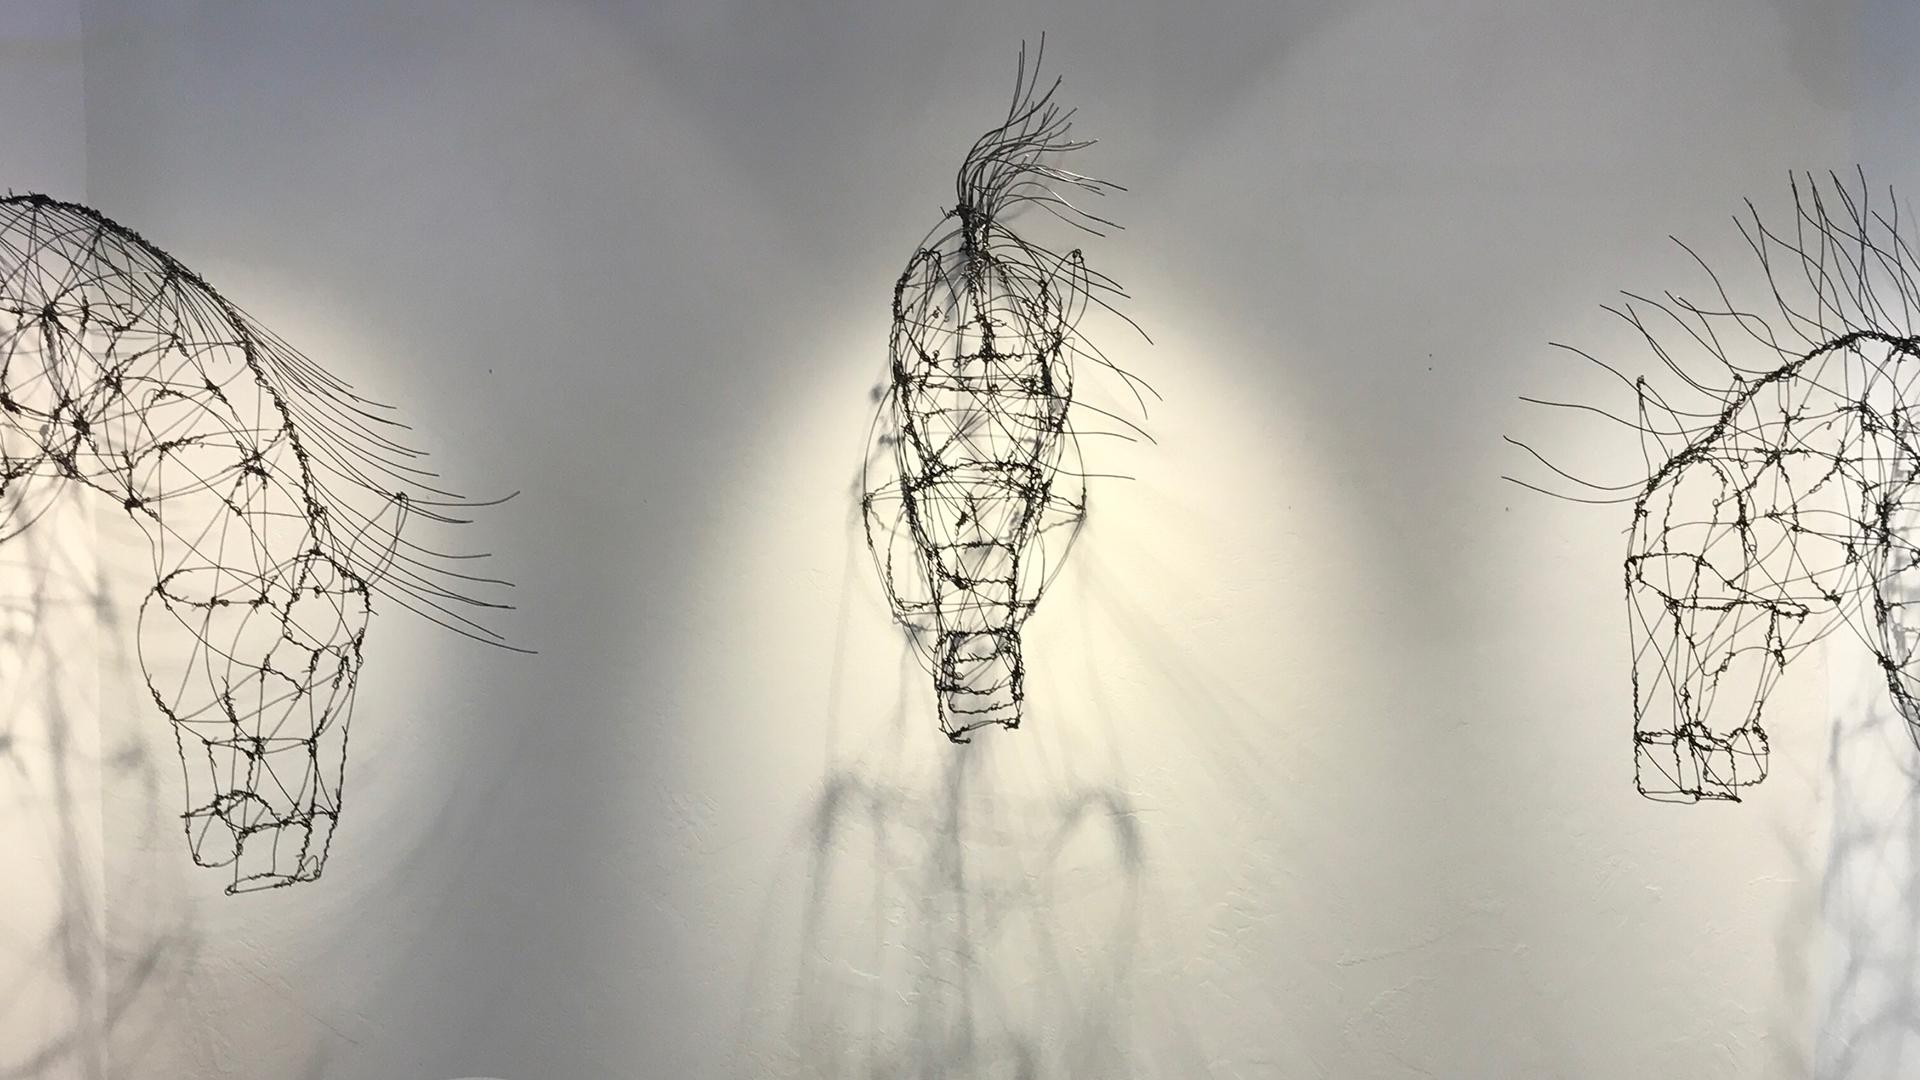 Cerulean Gallery to offer new take on Southwestern art in 'Modern West'